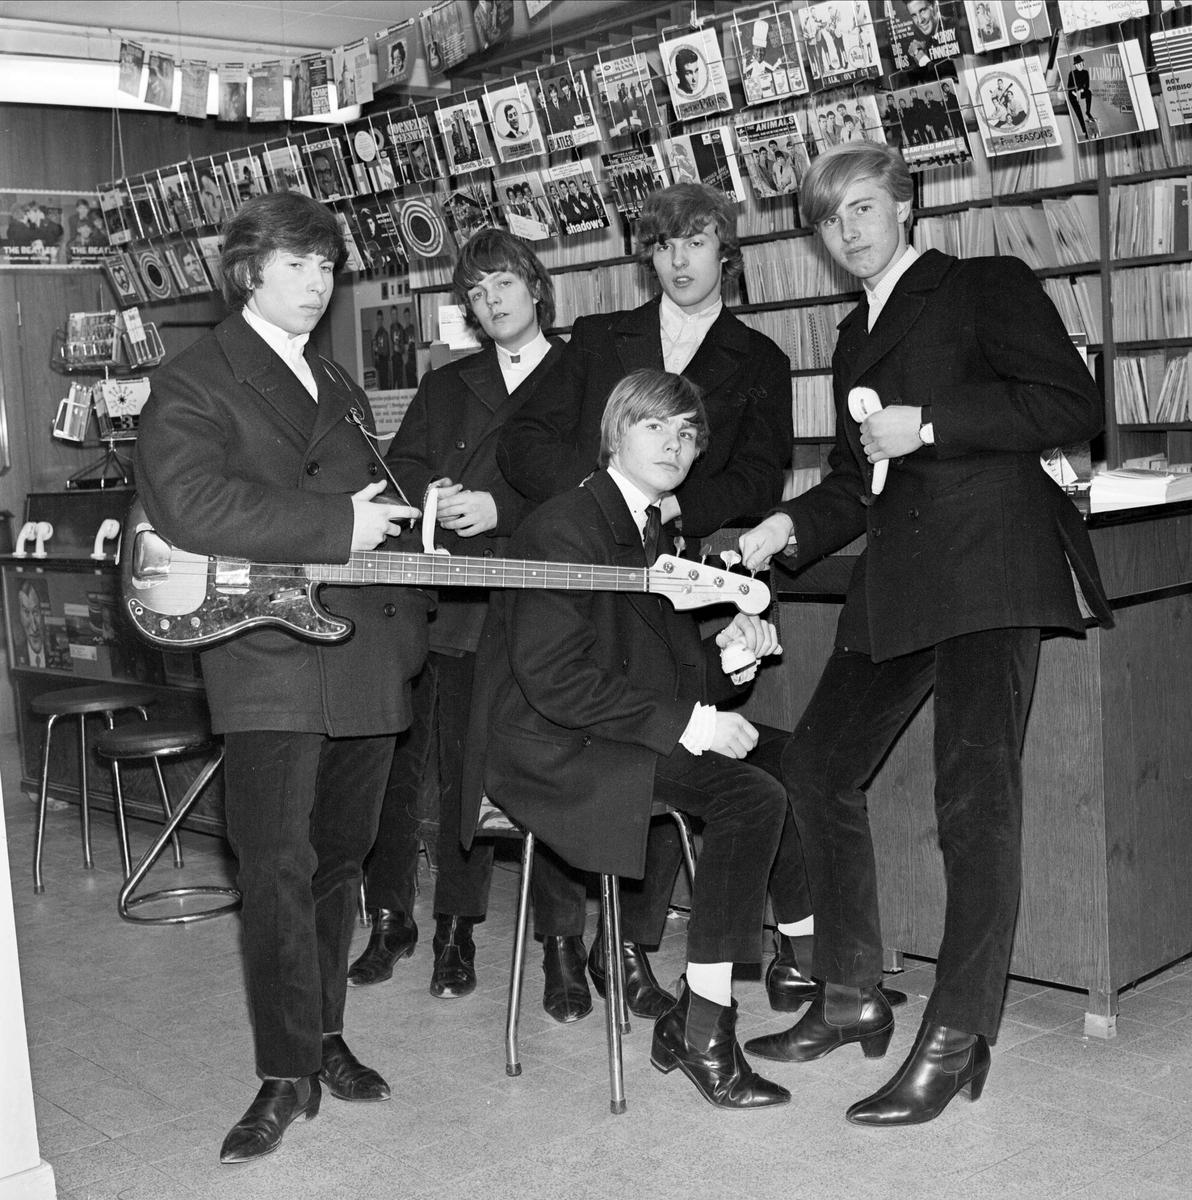 Musikgruppen The Nashmen hos Rulfs Musikhandel, Vaksalagatan 6, Uppsala 1964